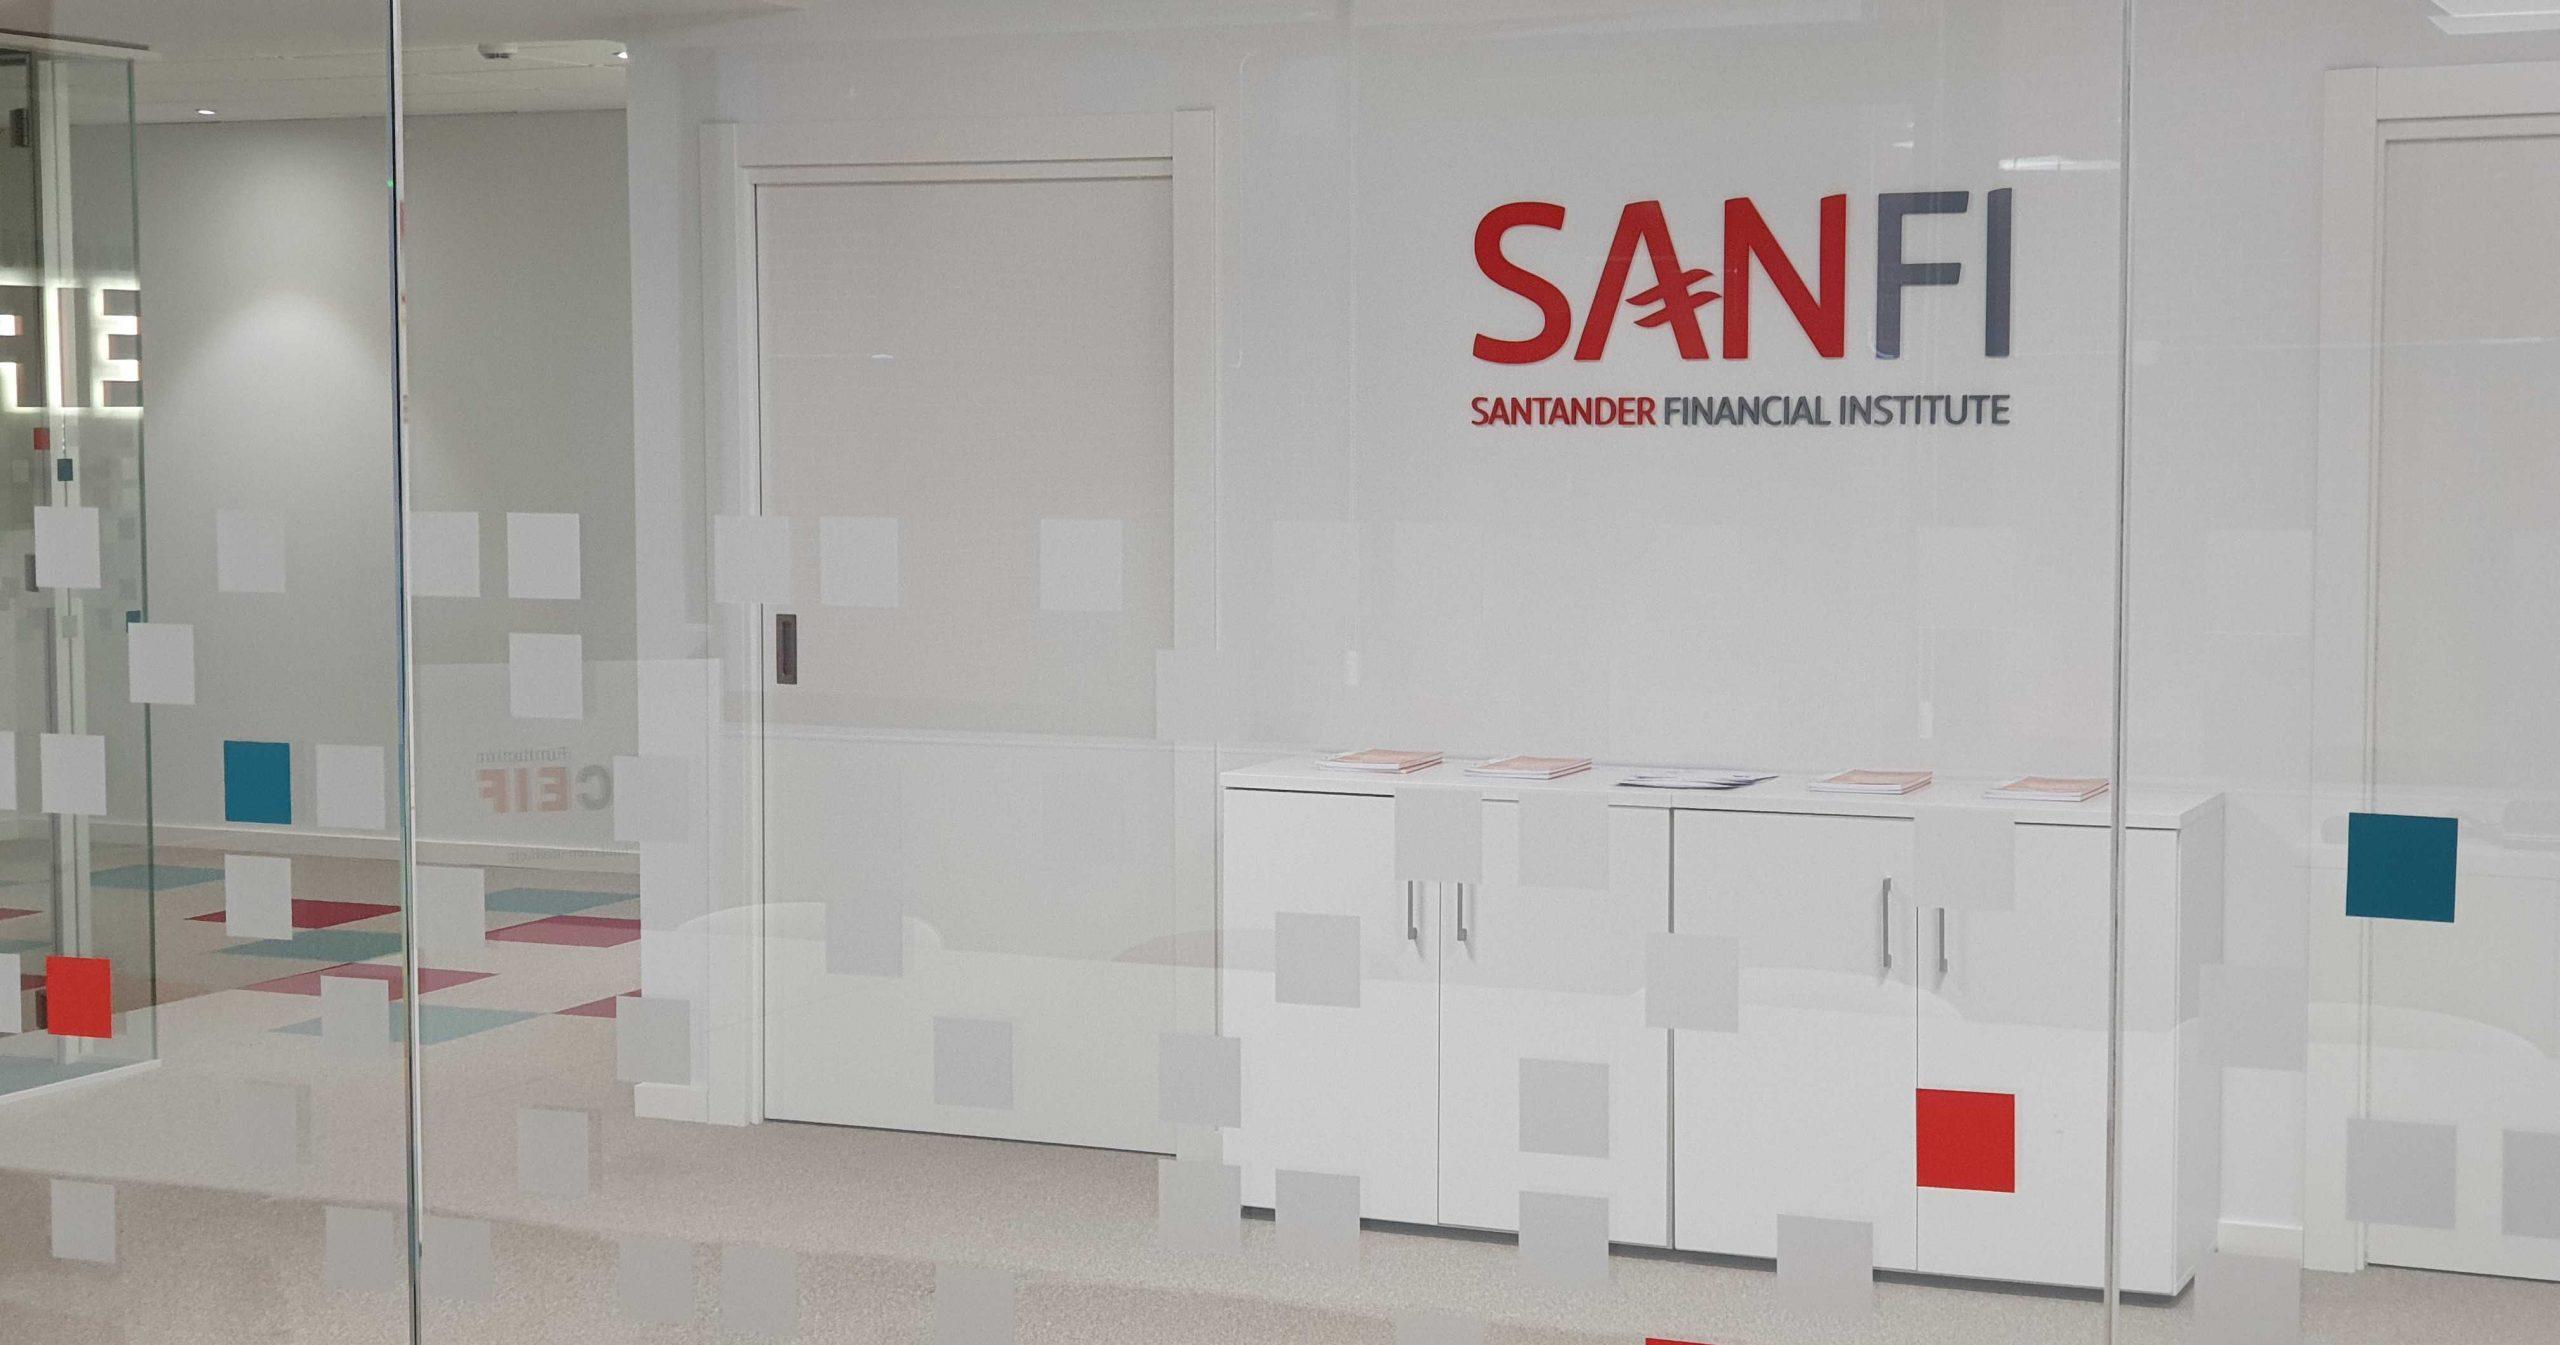 Santander Financial Institute